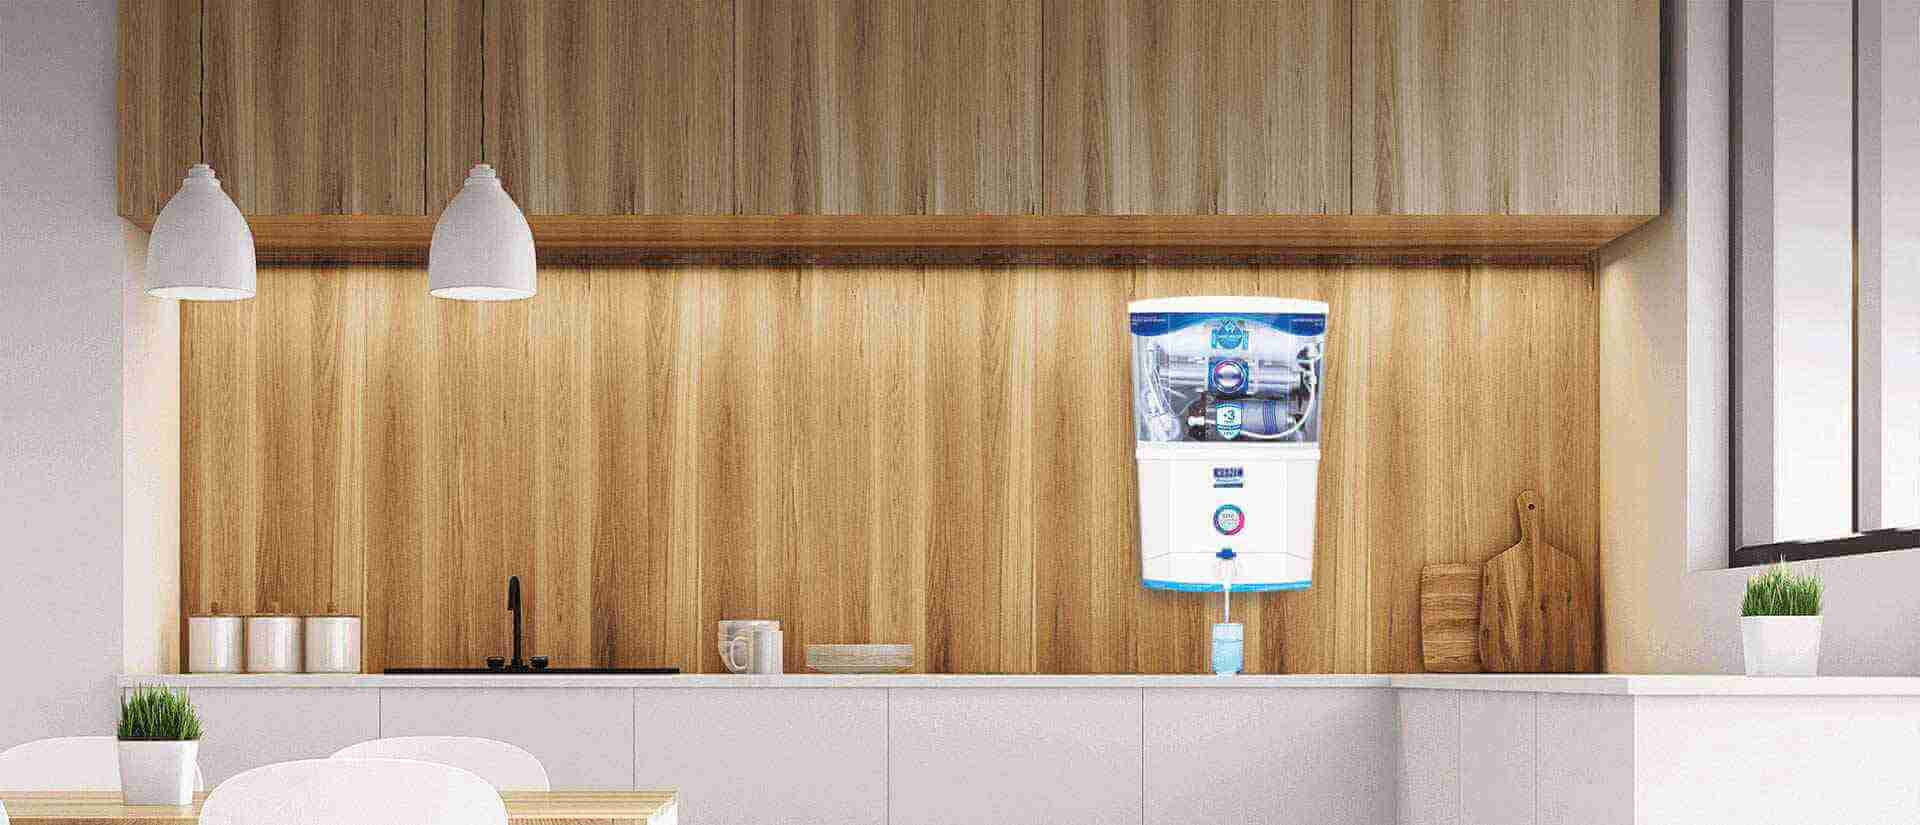 modular kitchen with water purifier